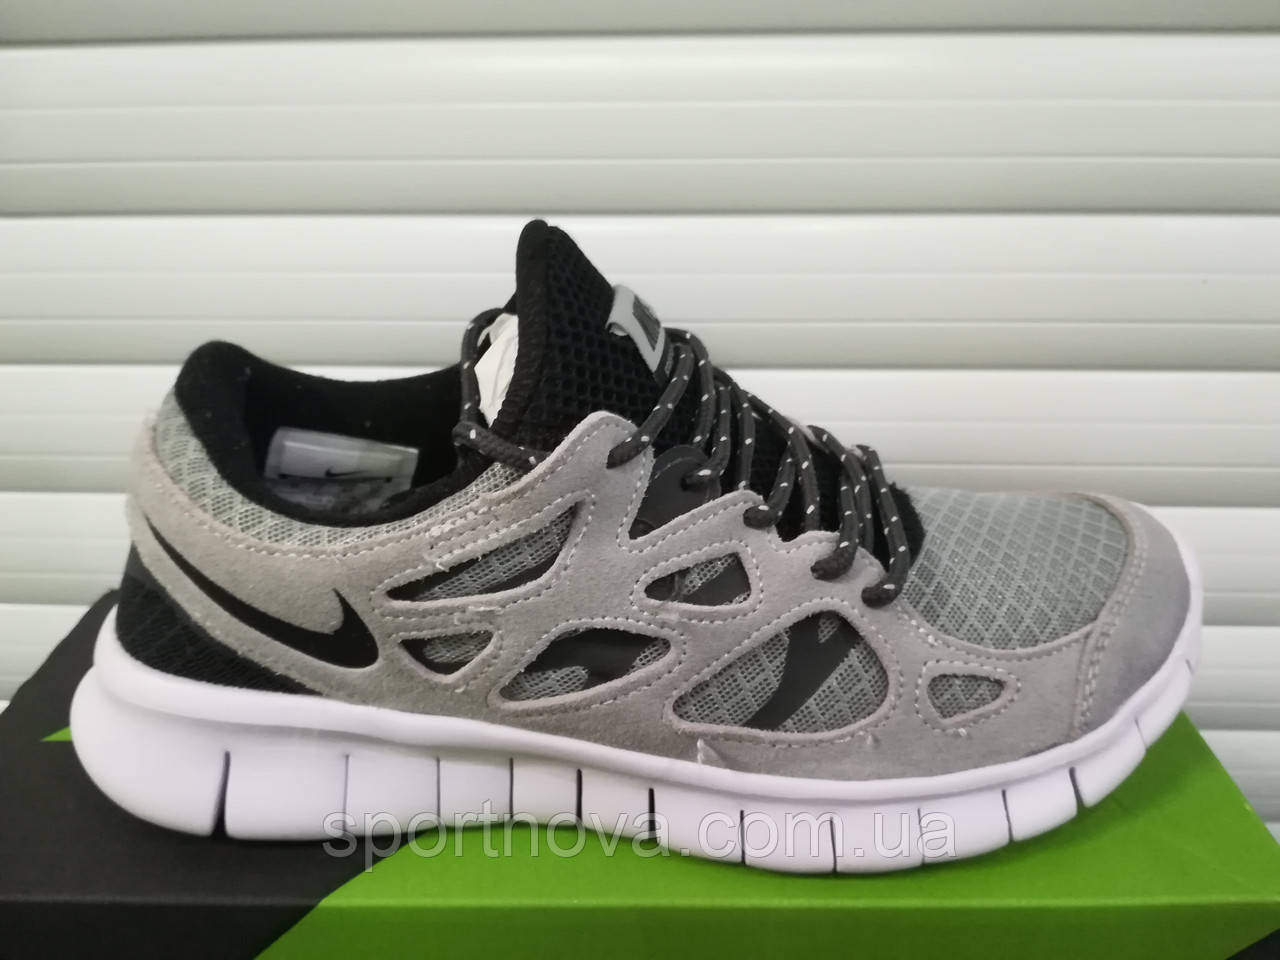 1c24c404 Кроссовки Nike Freе Run 2+